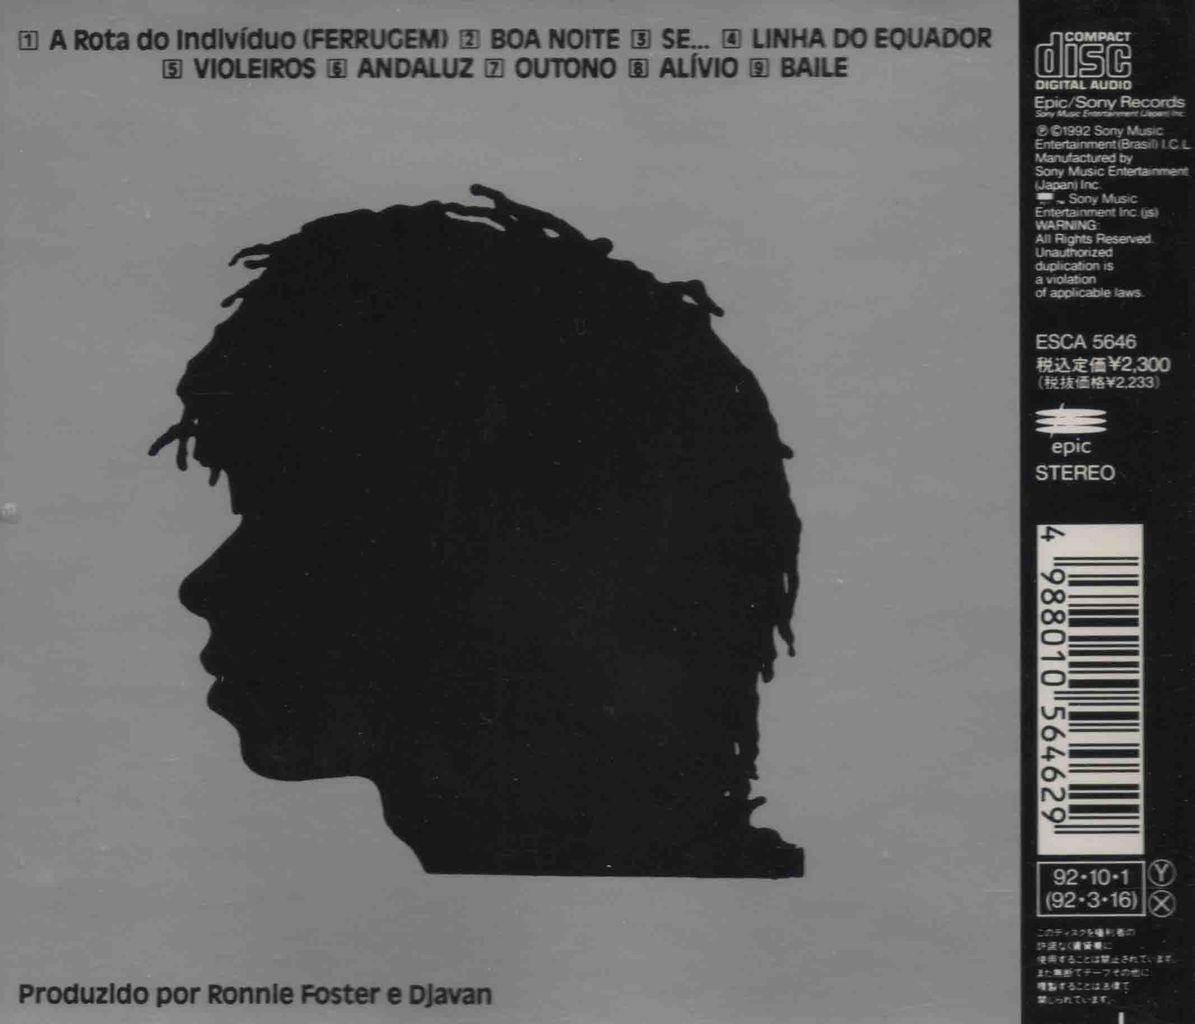 COISA DE ACENDER-2